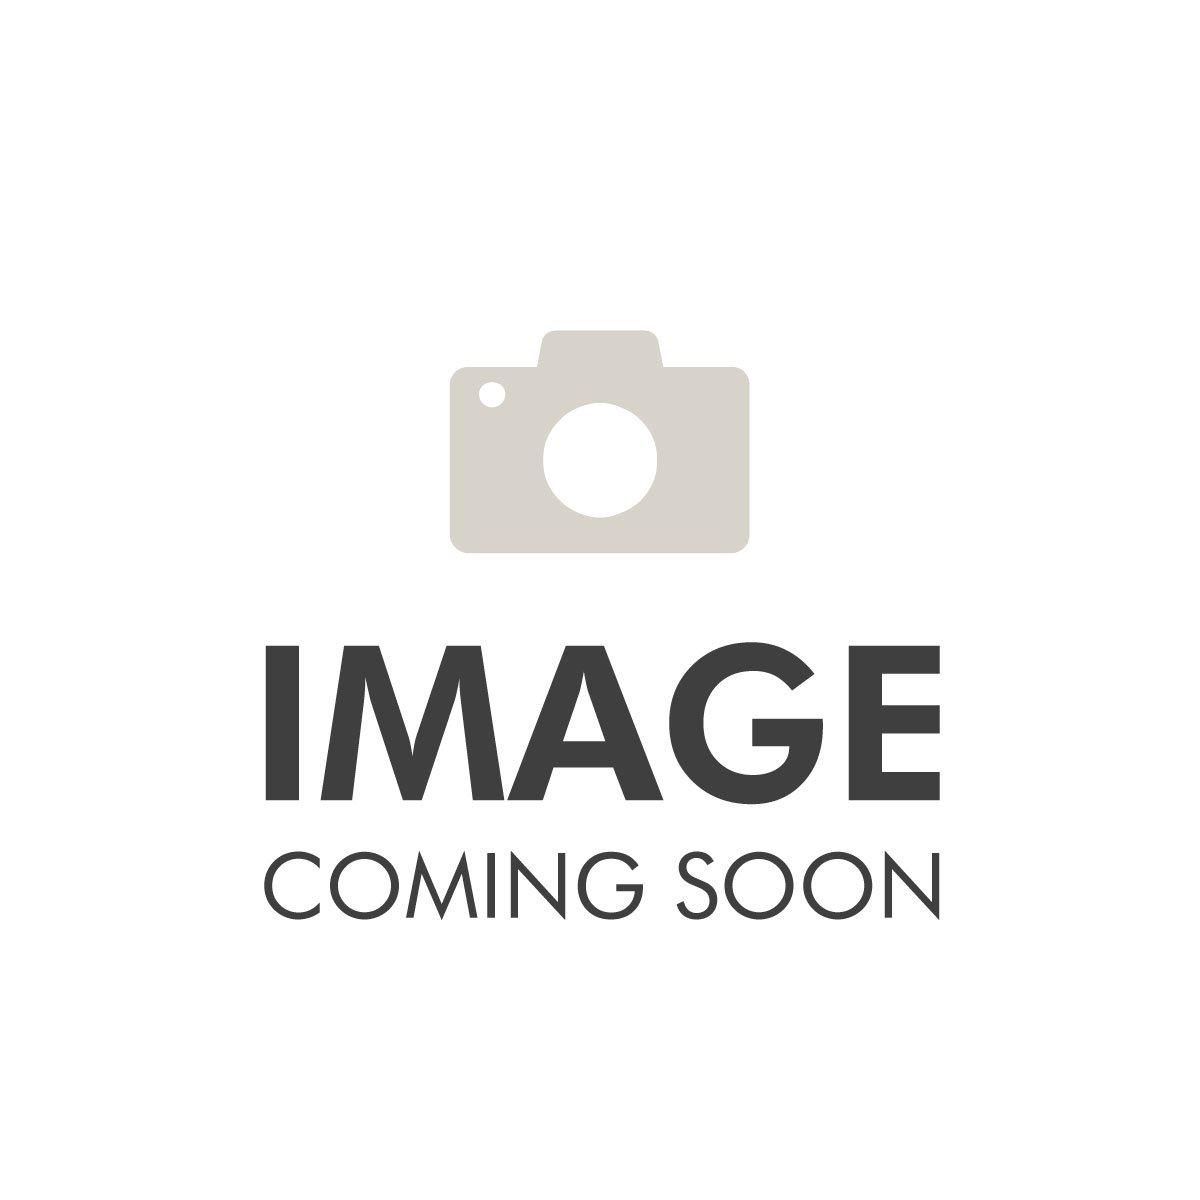 Adidas Fragrances Adidas Pure Lightness 50ml EDT Spray